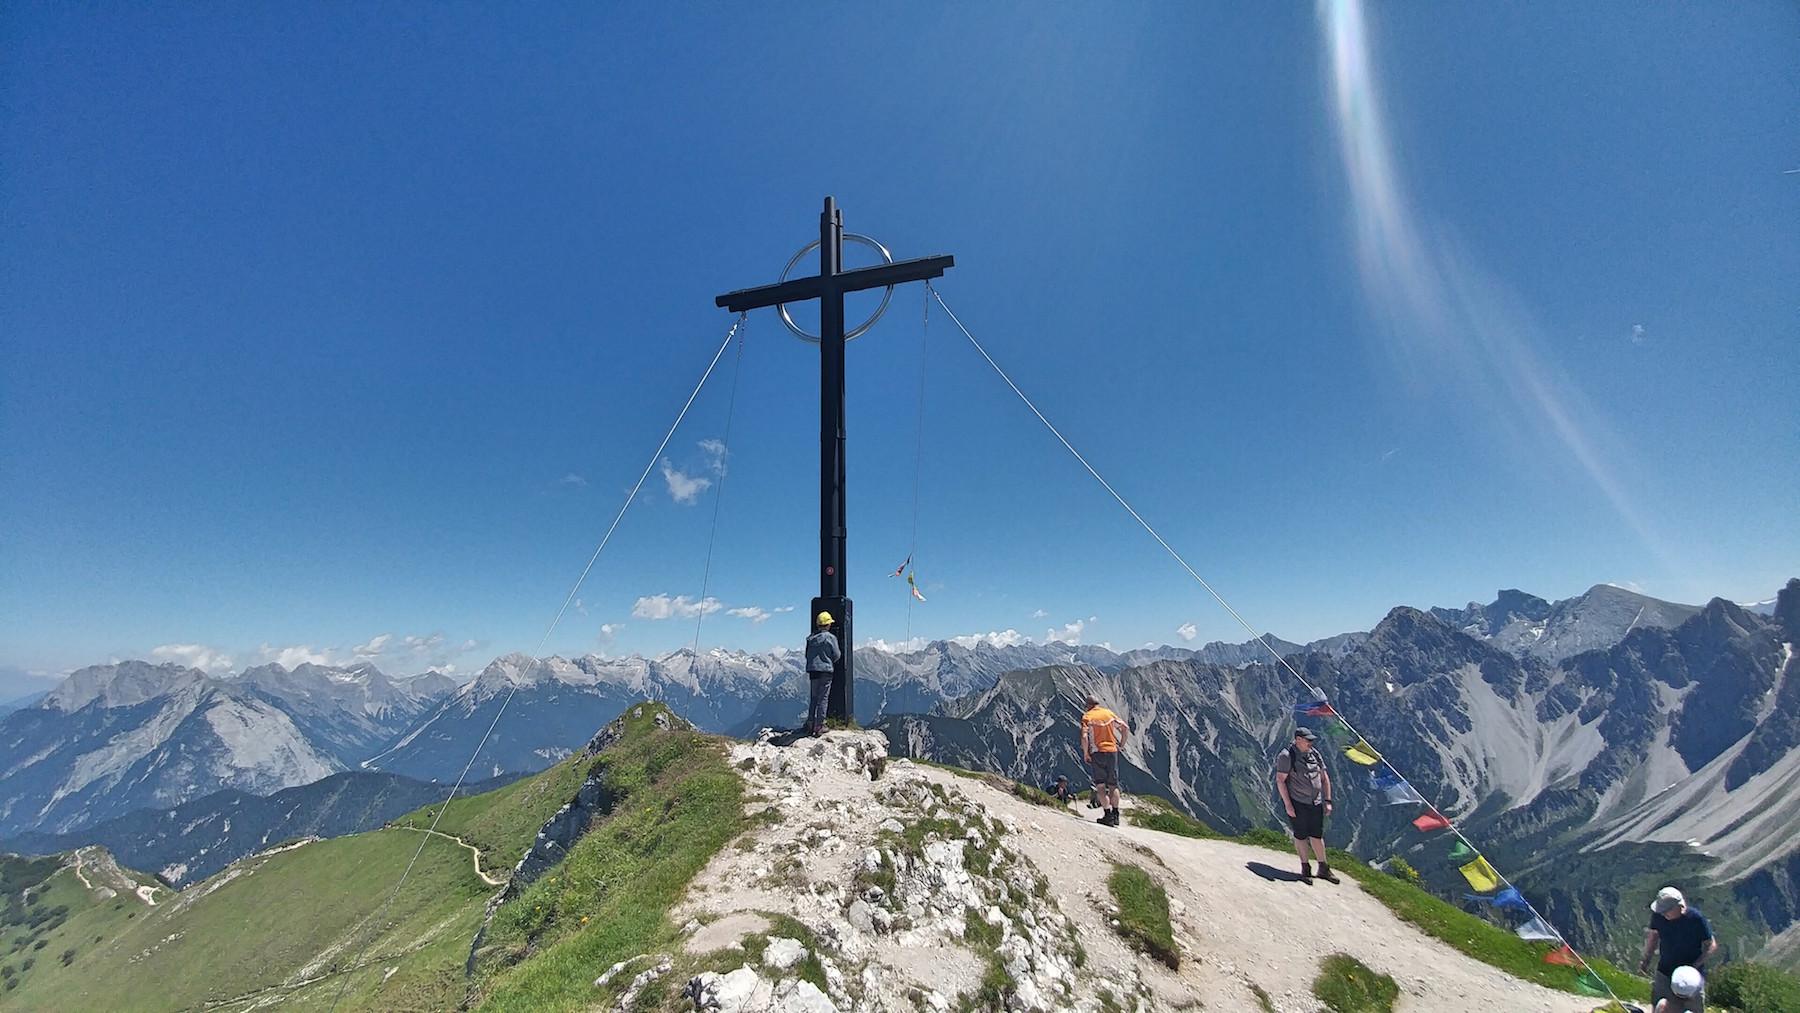 04-Seefelder-Spitze-Joch-Reither-Spitze-Gipfel-panorama